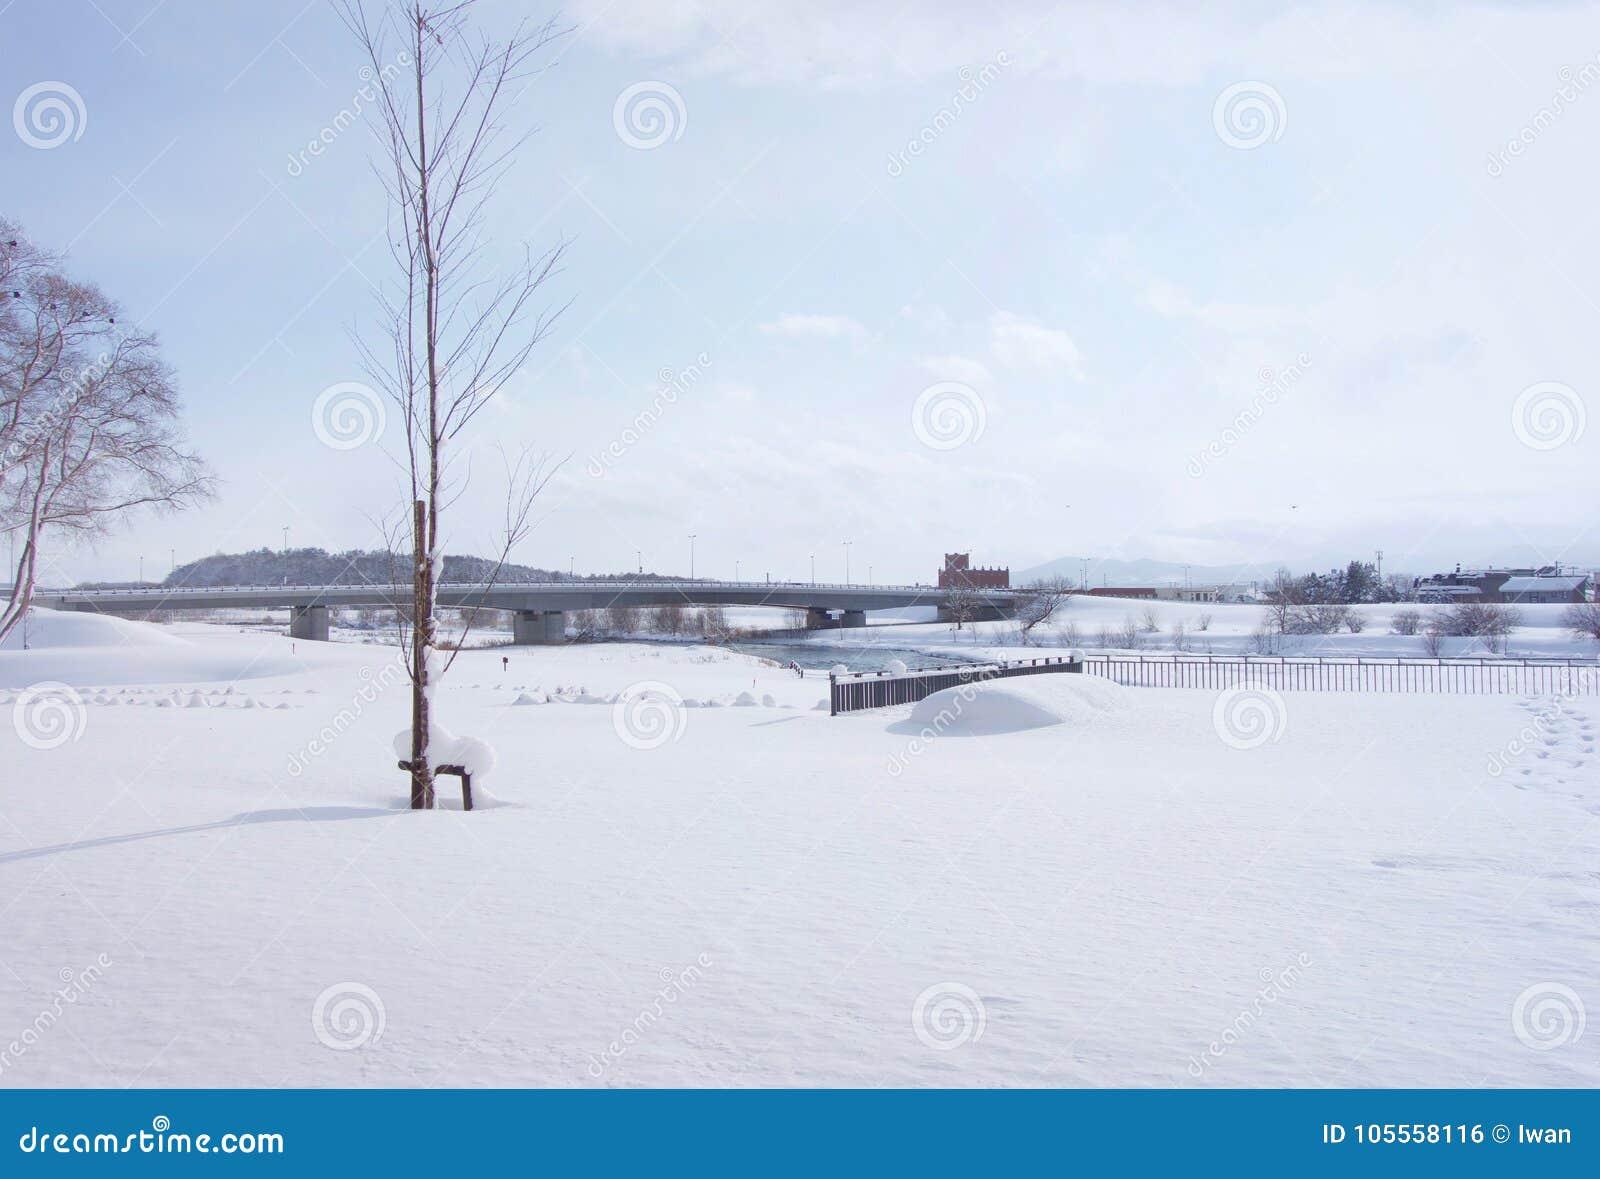 Snow Blanket in Asahikawa, Hokkaido, Japan.